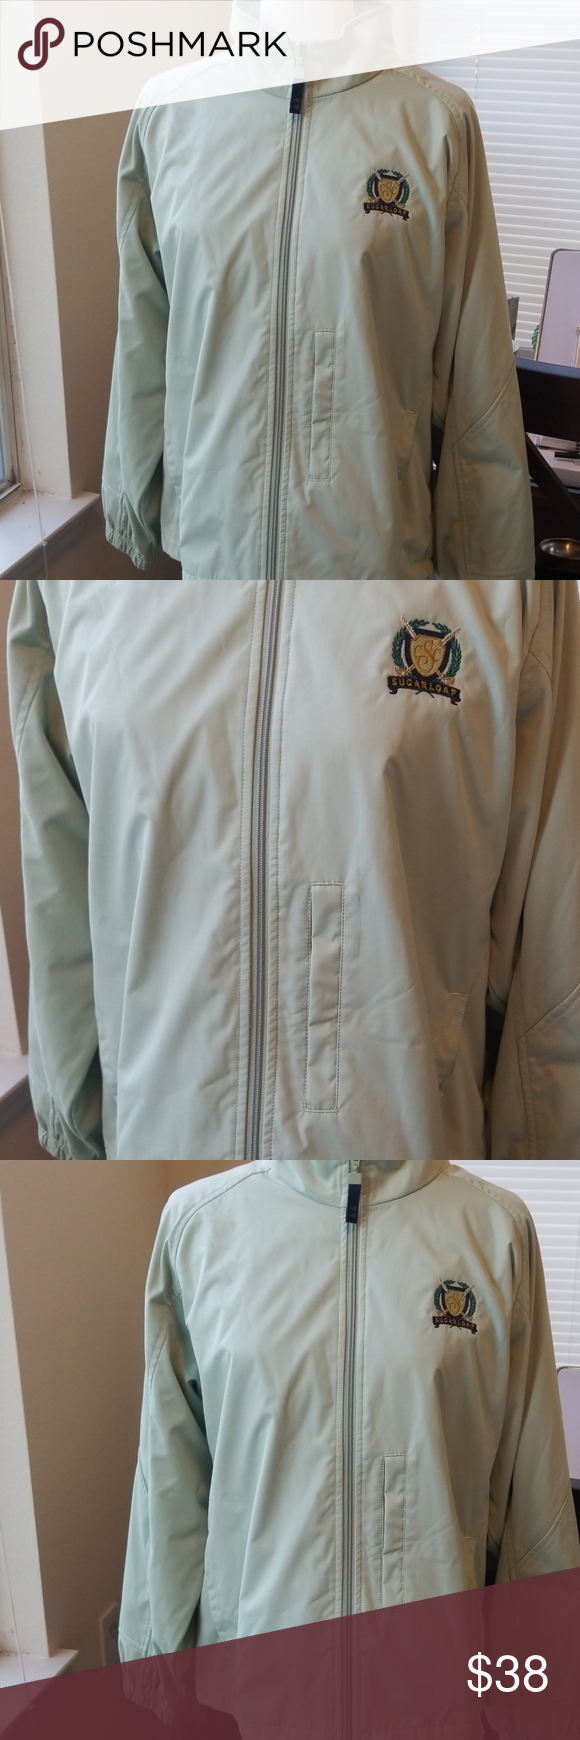 Nwot Women S Greg Norman Full Zip Jacket Zip Jackets Jackets Beautiful Jacket